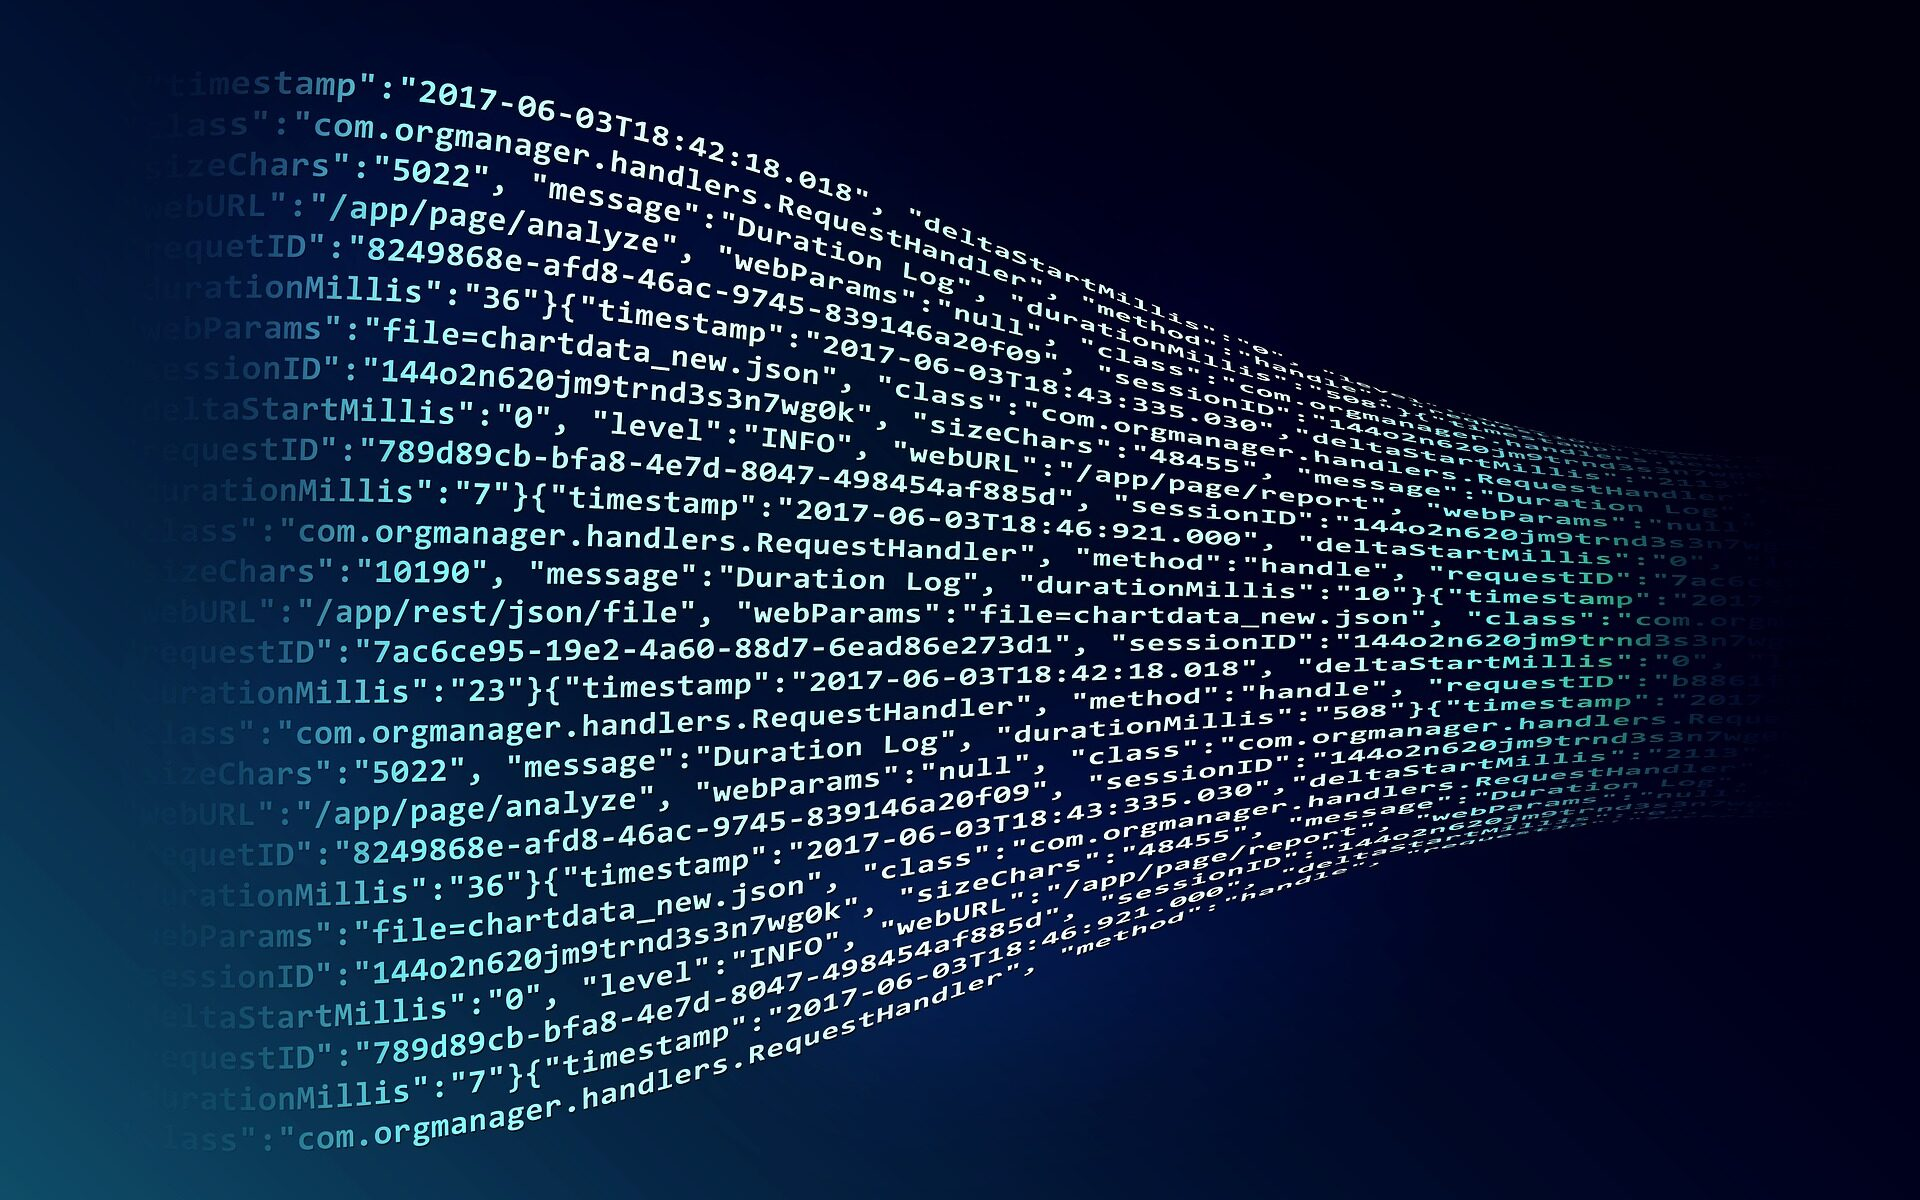 bigdata analytics hadoop